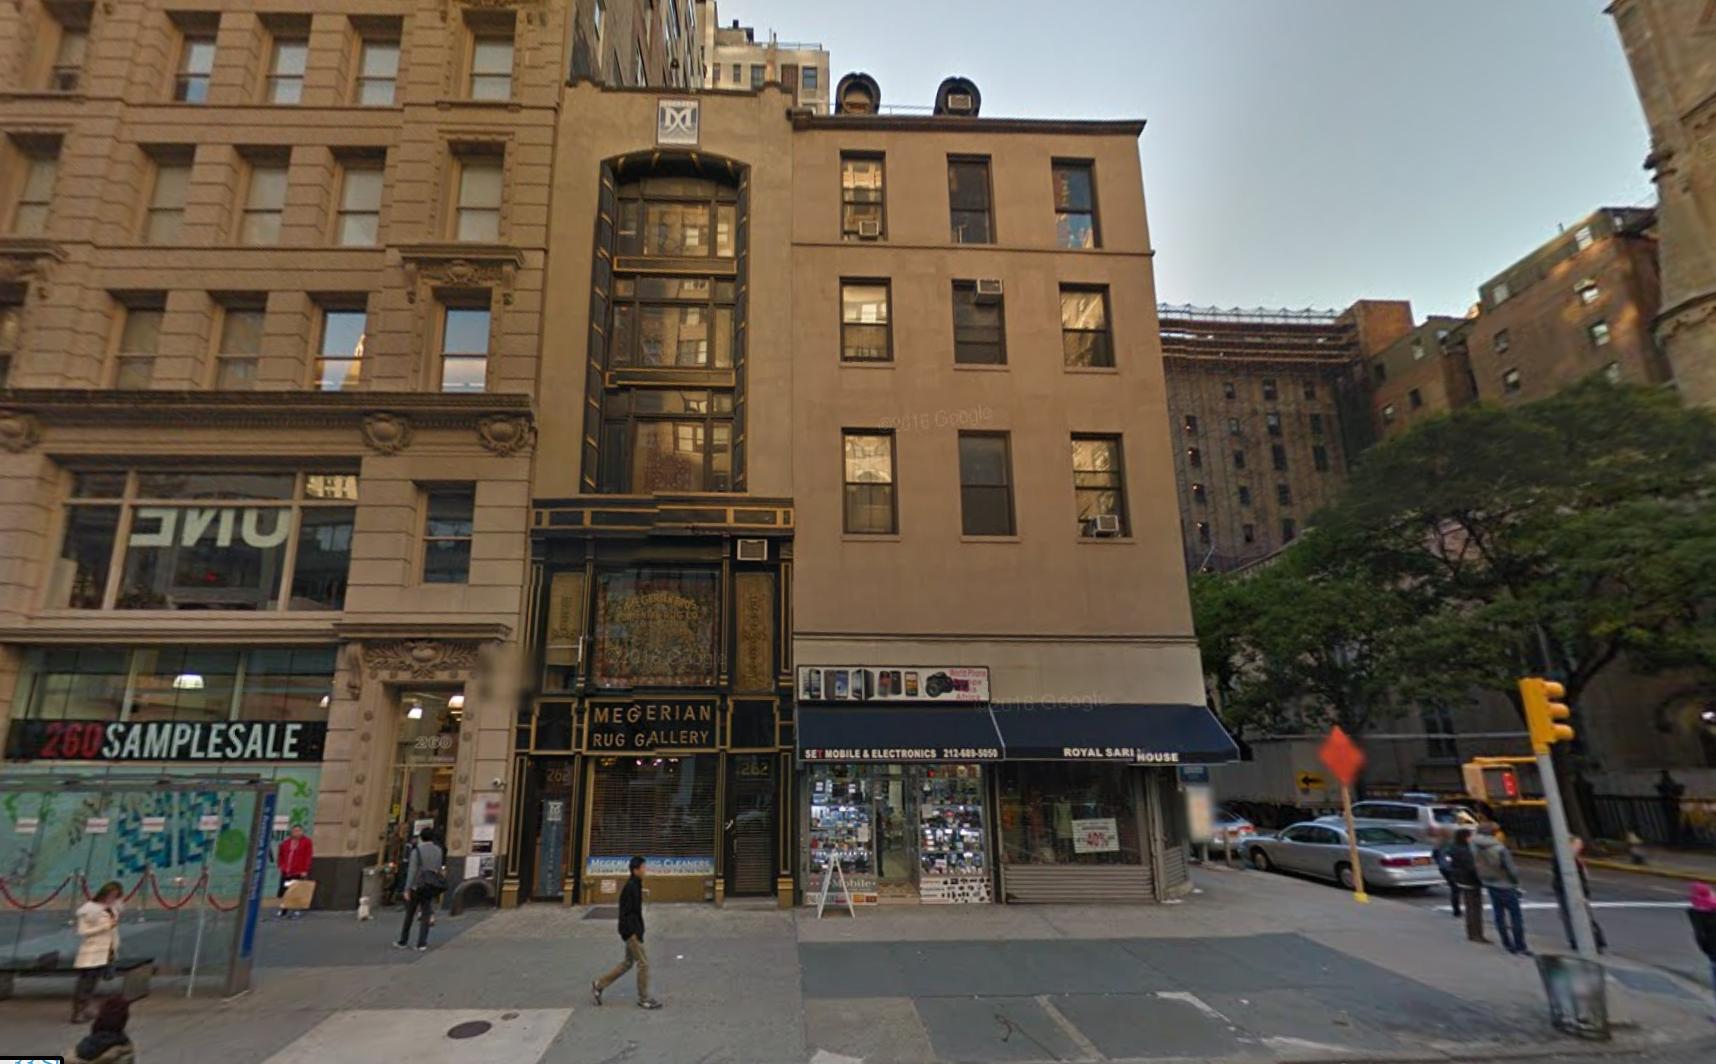 262 and 264 Fifth Avenue, image via Google Maps